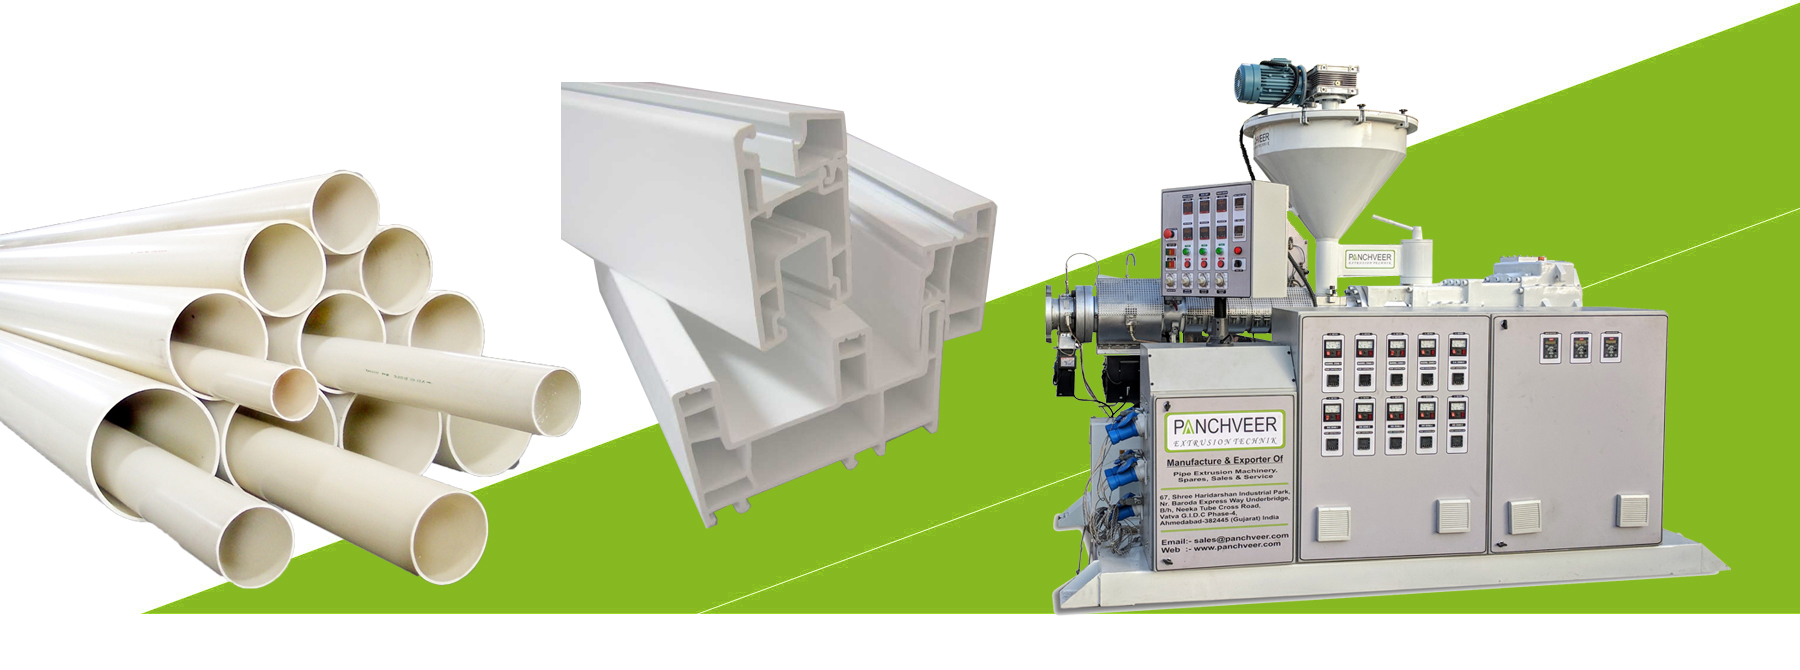 PVC Pipe Extrusion Plant For PVC Pipe & PVC Profile